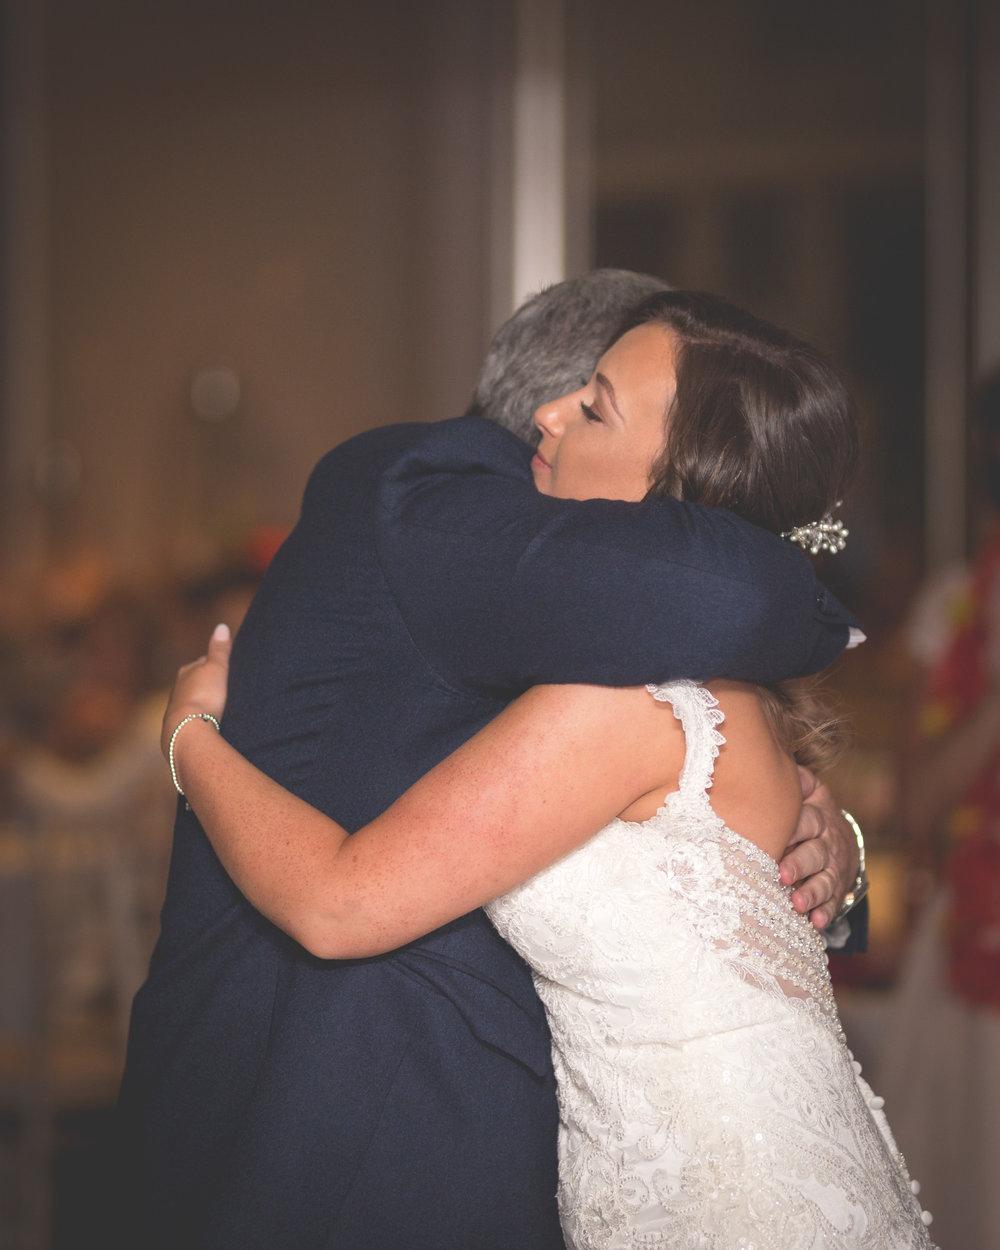 Brian McEwan   Northern Ireland Wedding Photographer   Rebecca & Michael   Dancing-15.jpg